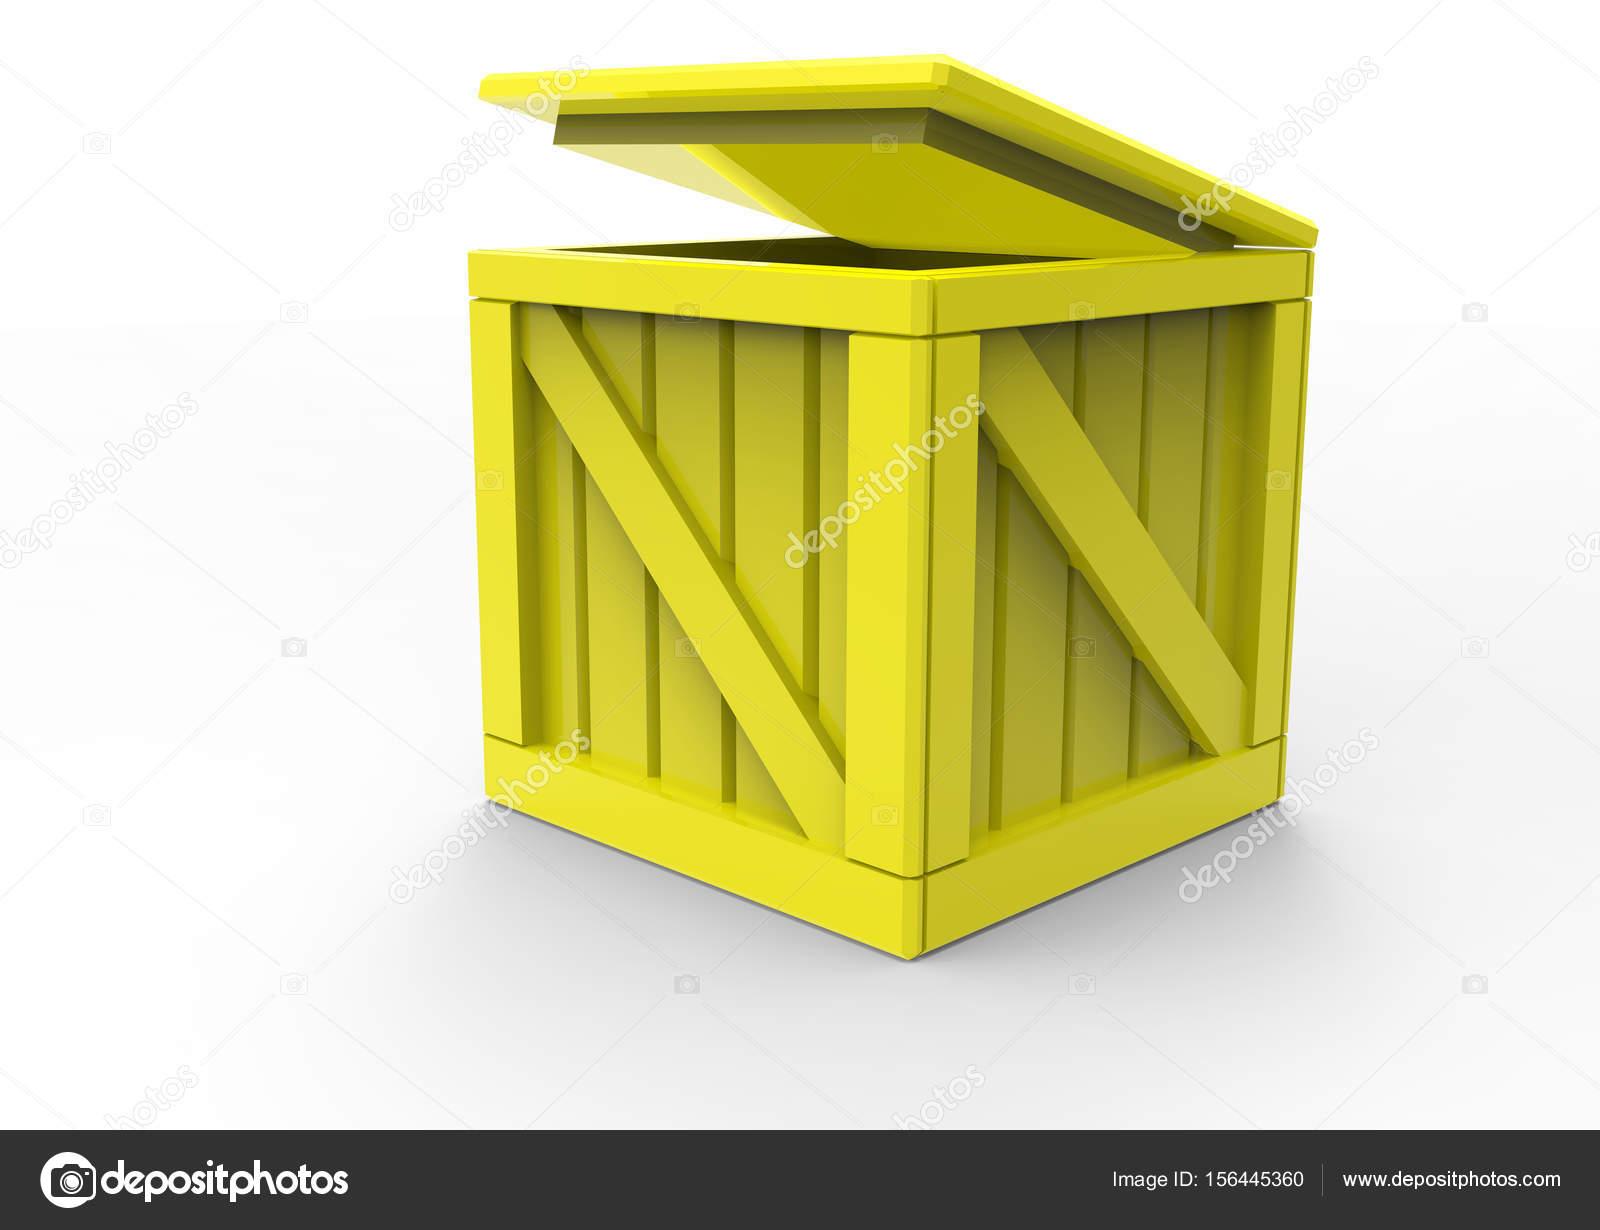 Rahmen aus Holz Box 3d — Stockfoto © blankvoid #156445360